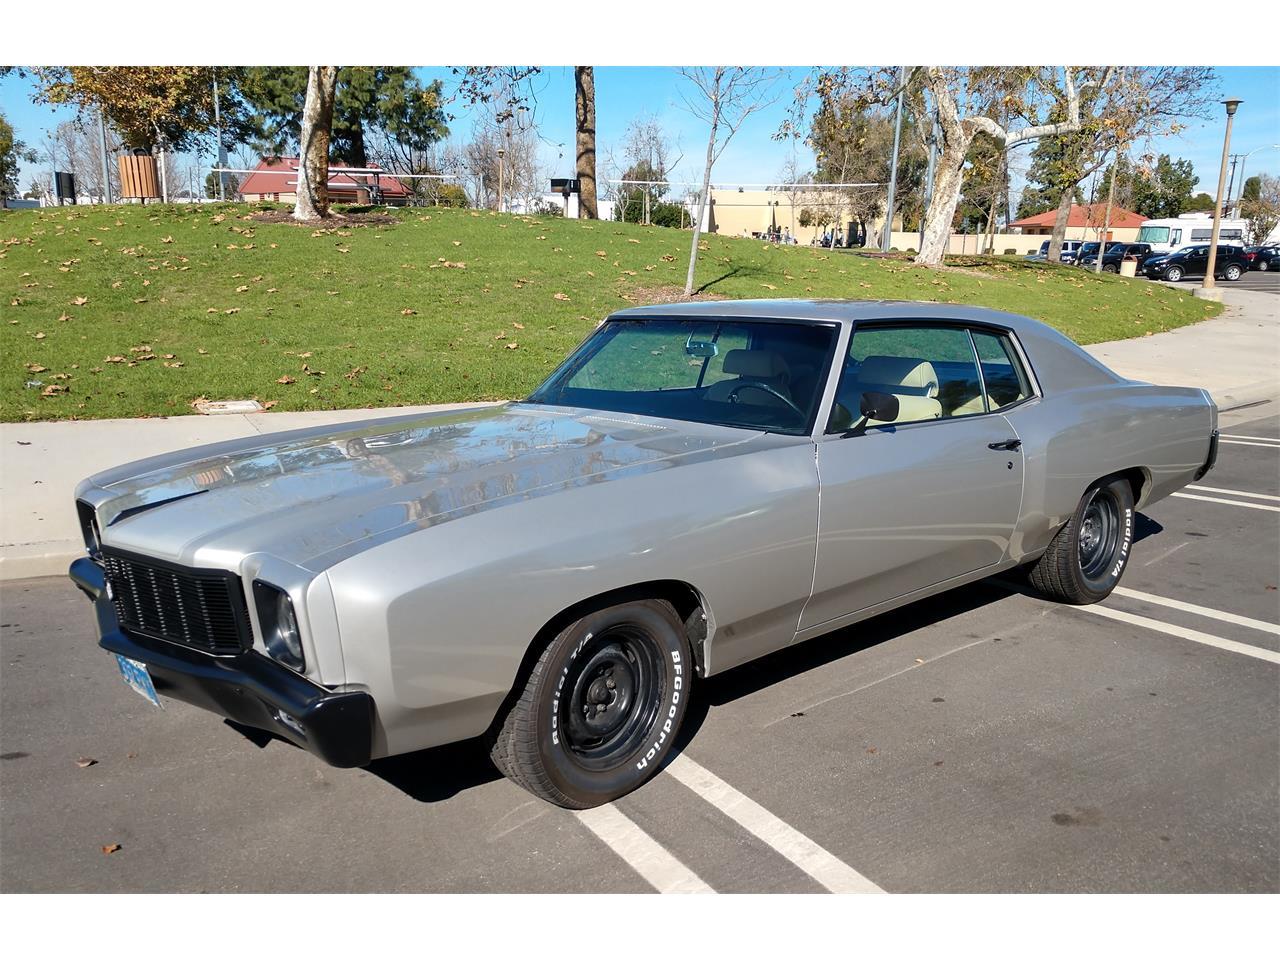 1971 Chevrolet Monte Carlo For Sale In Placentia Ca Classiccarsbay Com